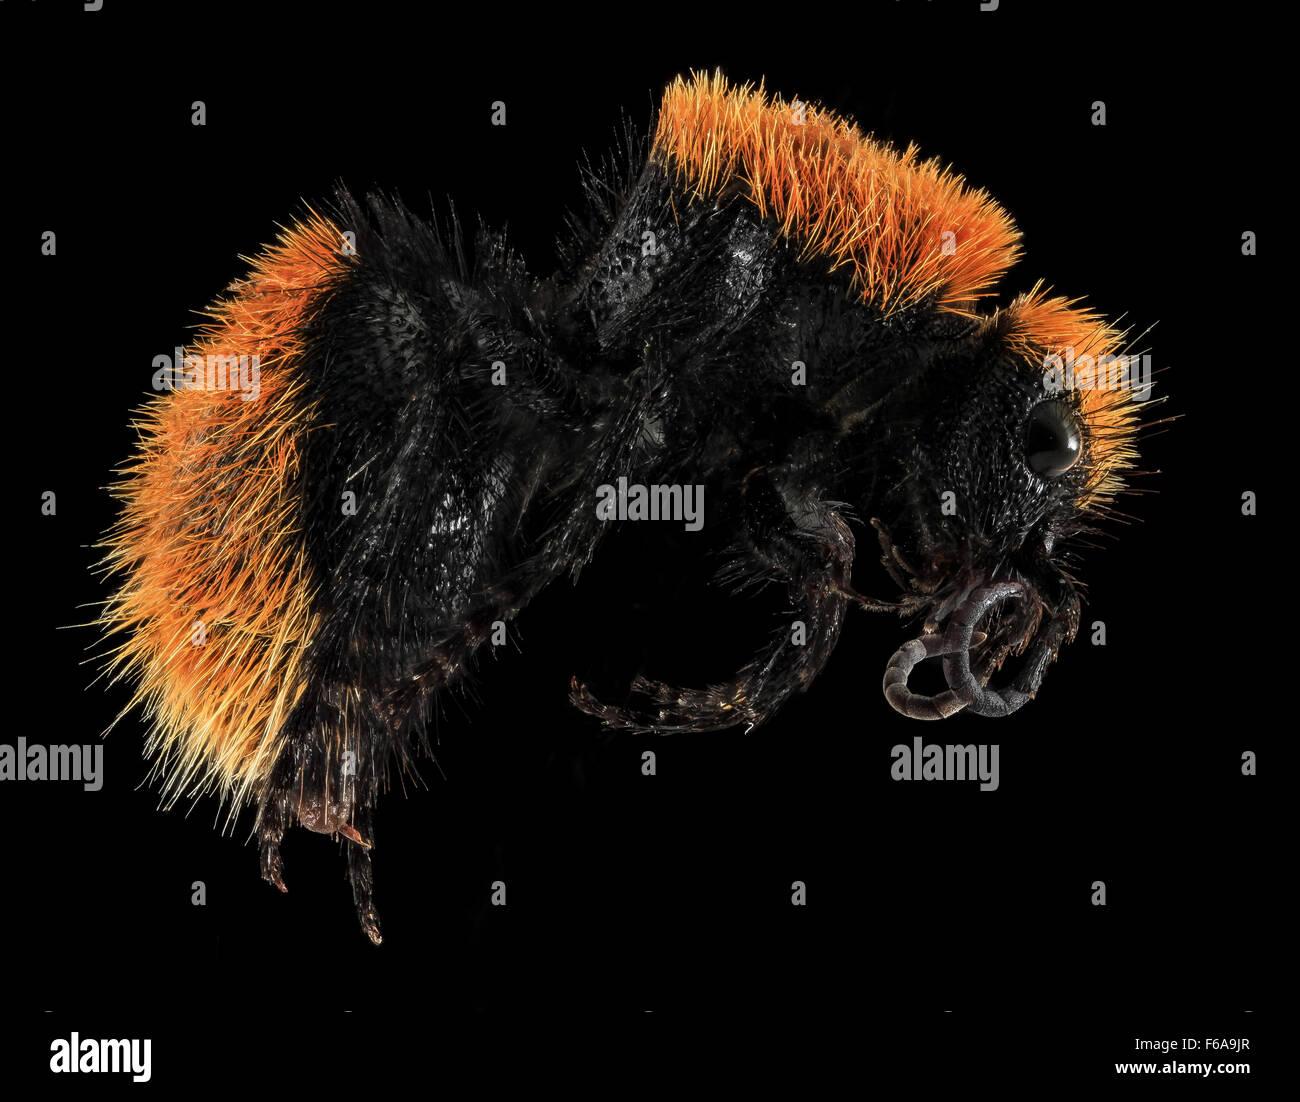 Velvet Ant, side, Badlands, Pennington Co, SD 2013-12-31-141337 ZS PMax - Stock Image